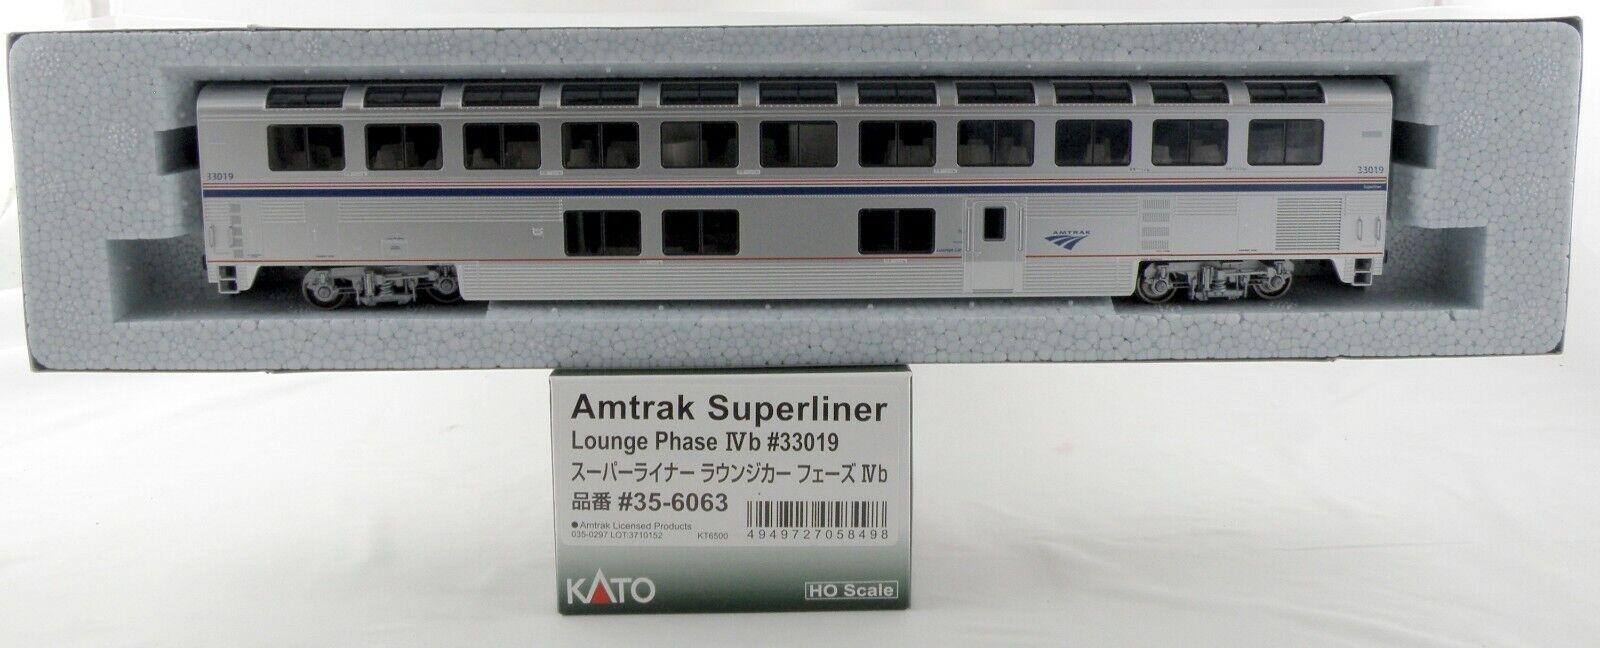 Escala Ho Amtrak súperliner Lounge Coche-fase estadio  33019 - Kato  35-6063